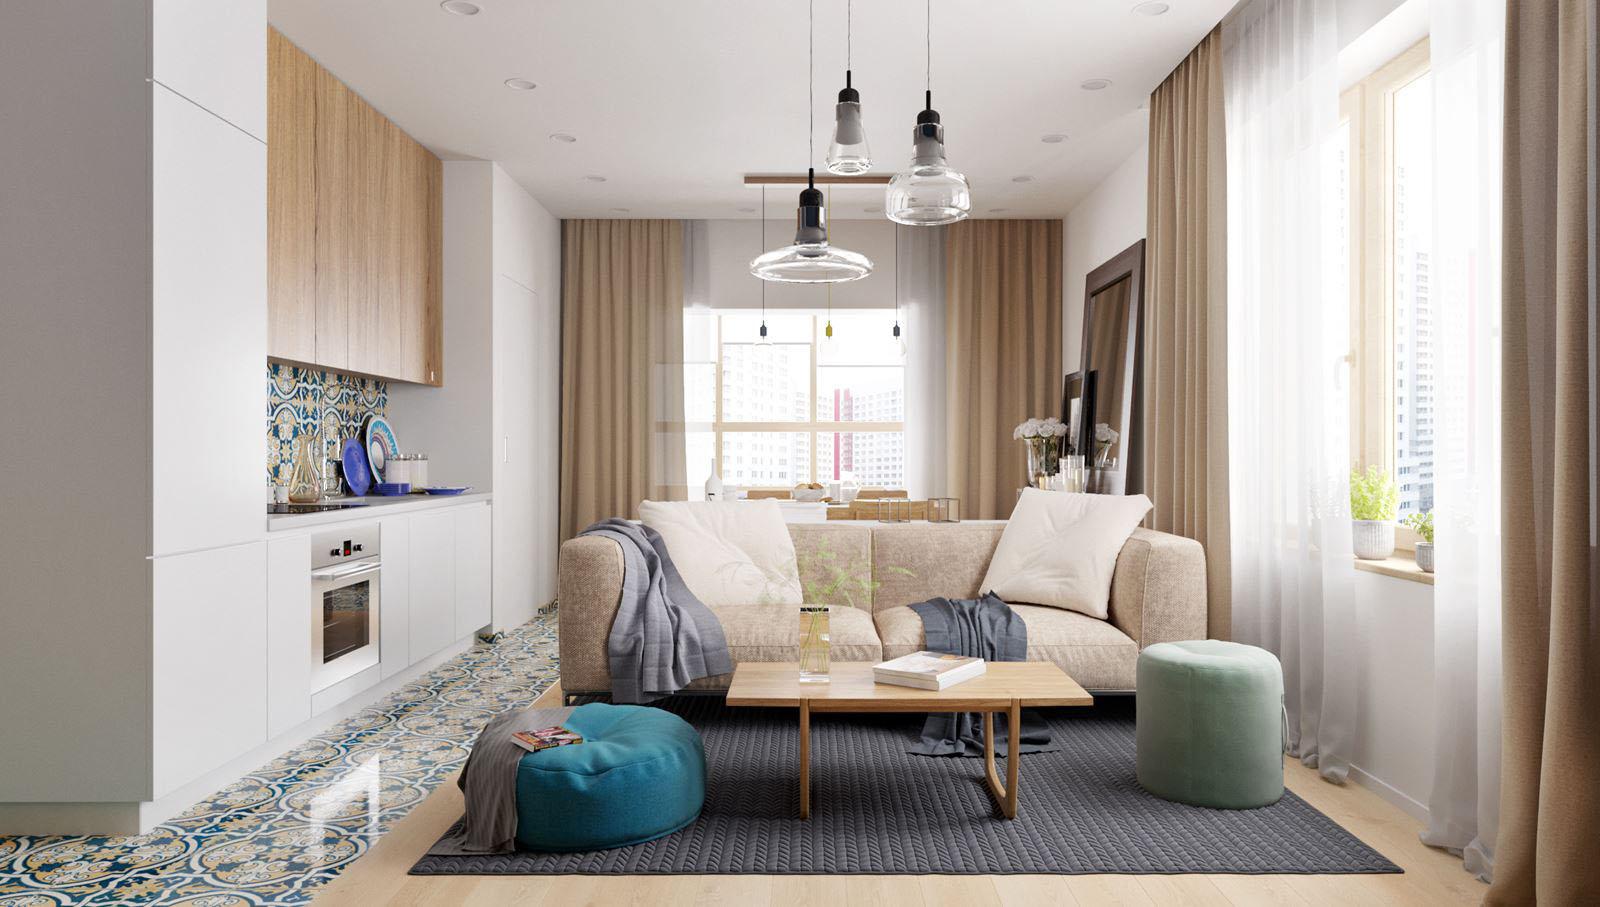 Small Studio Apartment Design Tiny Spaces